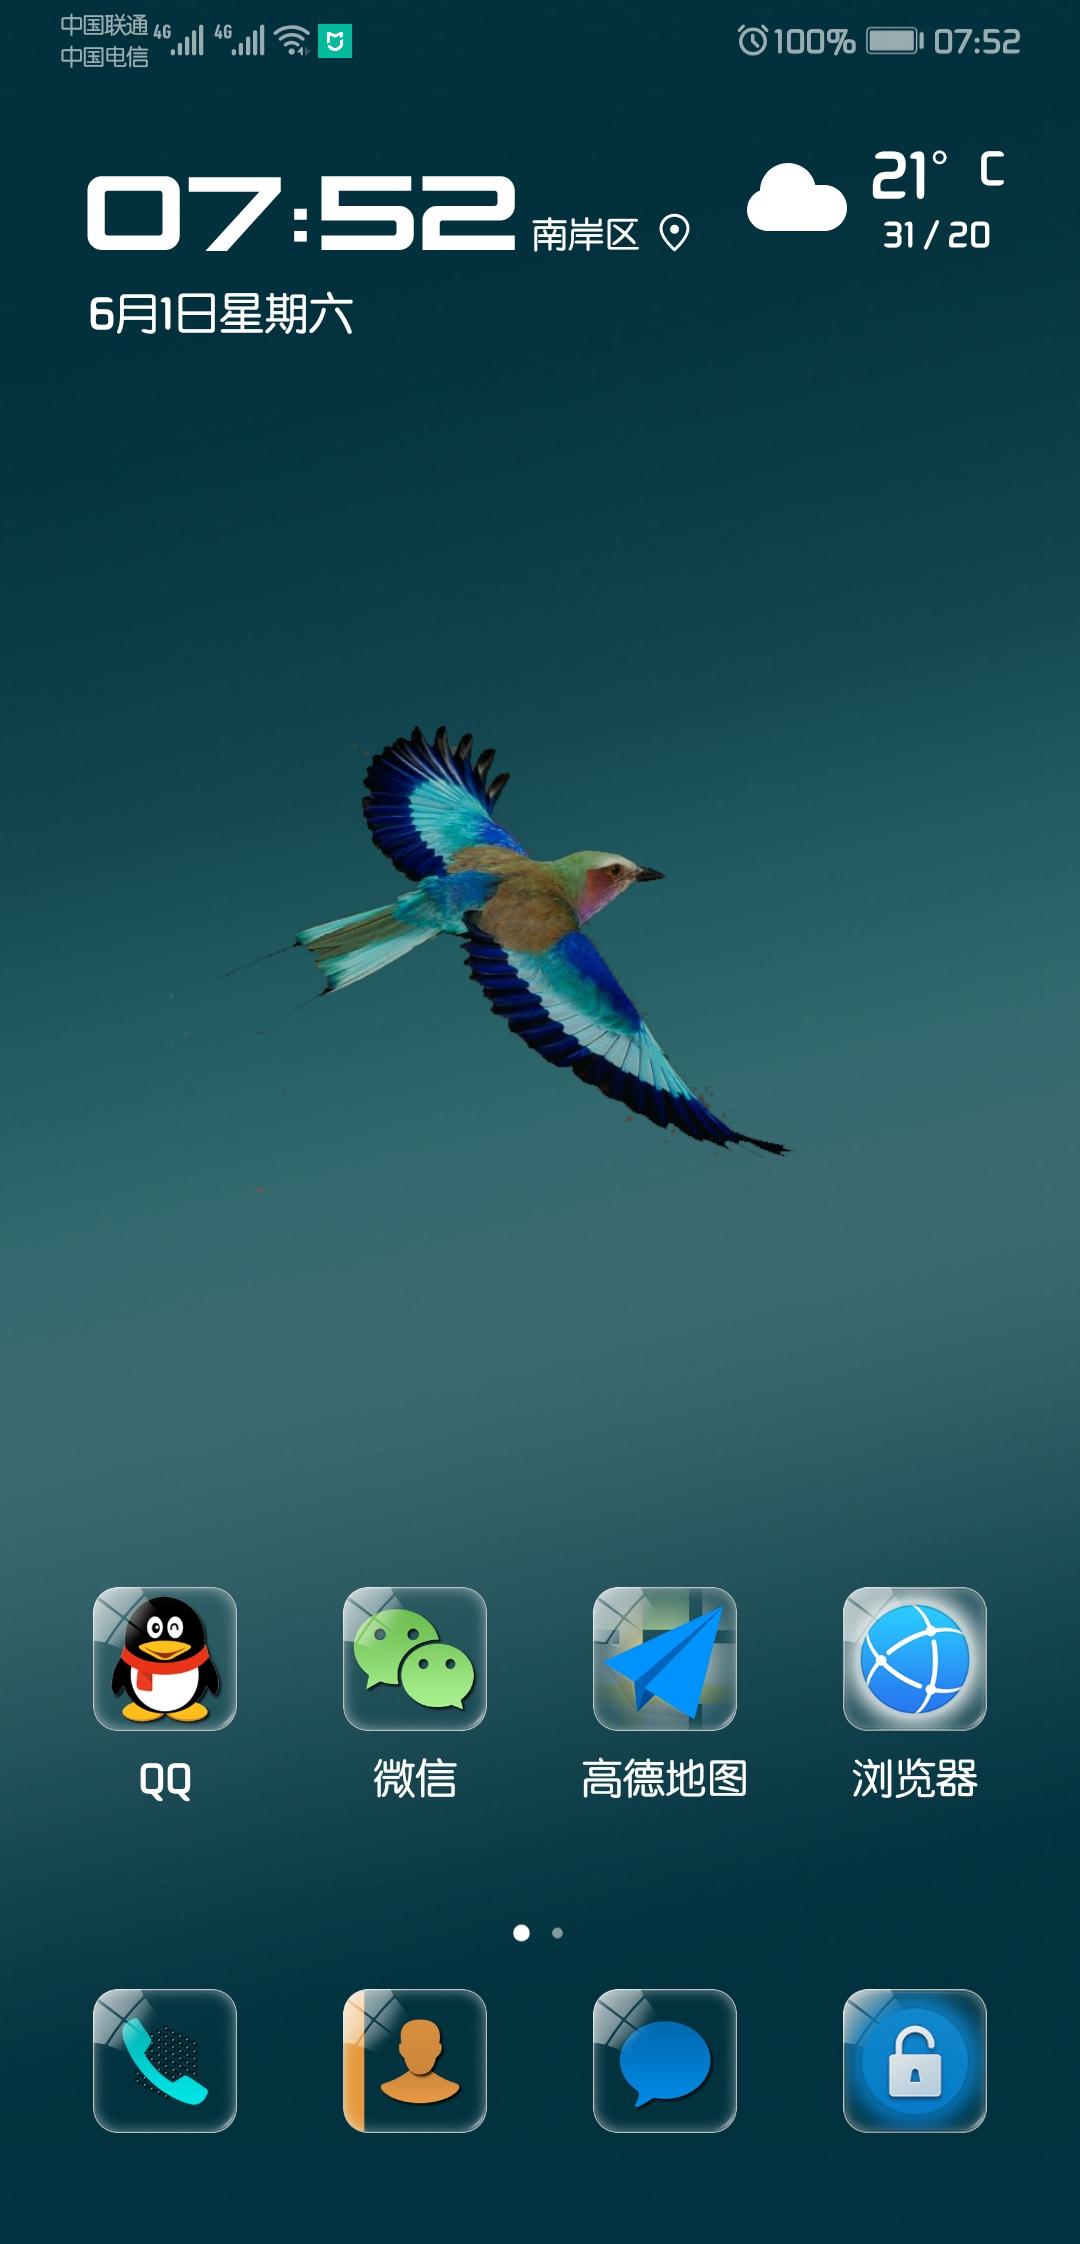 Screenshot_20190601_075228_com.huawei.android.lau.jpg